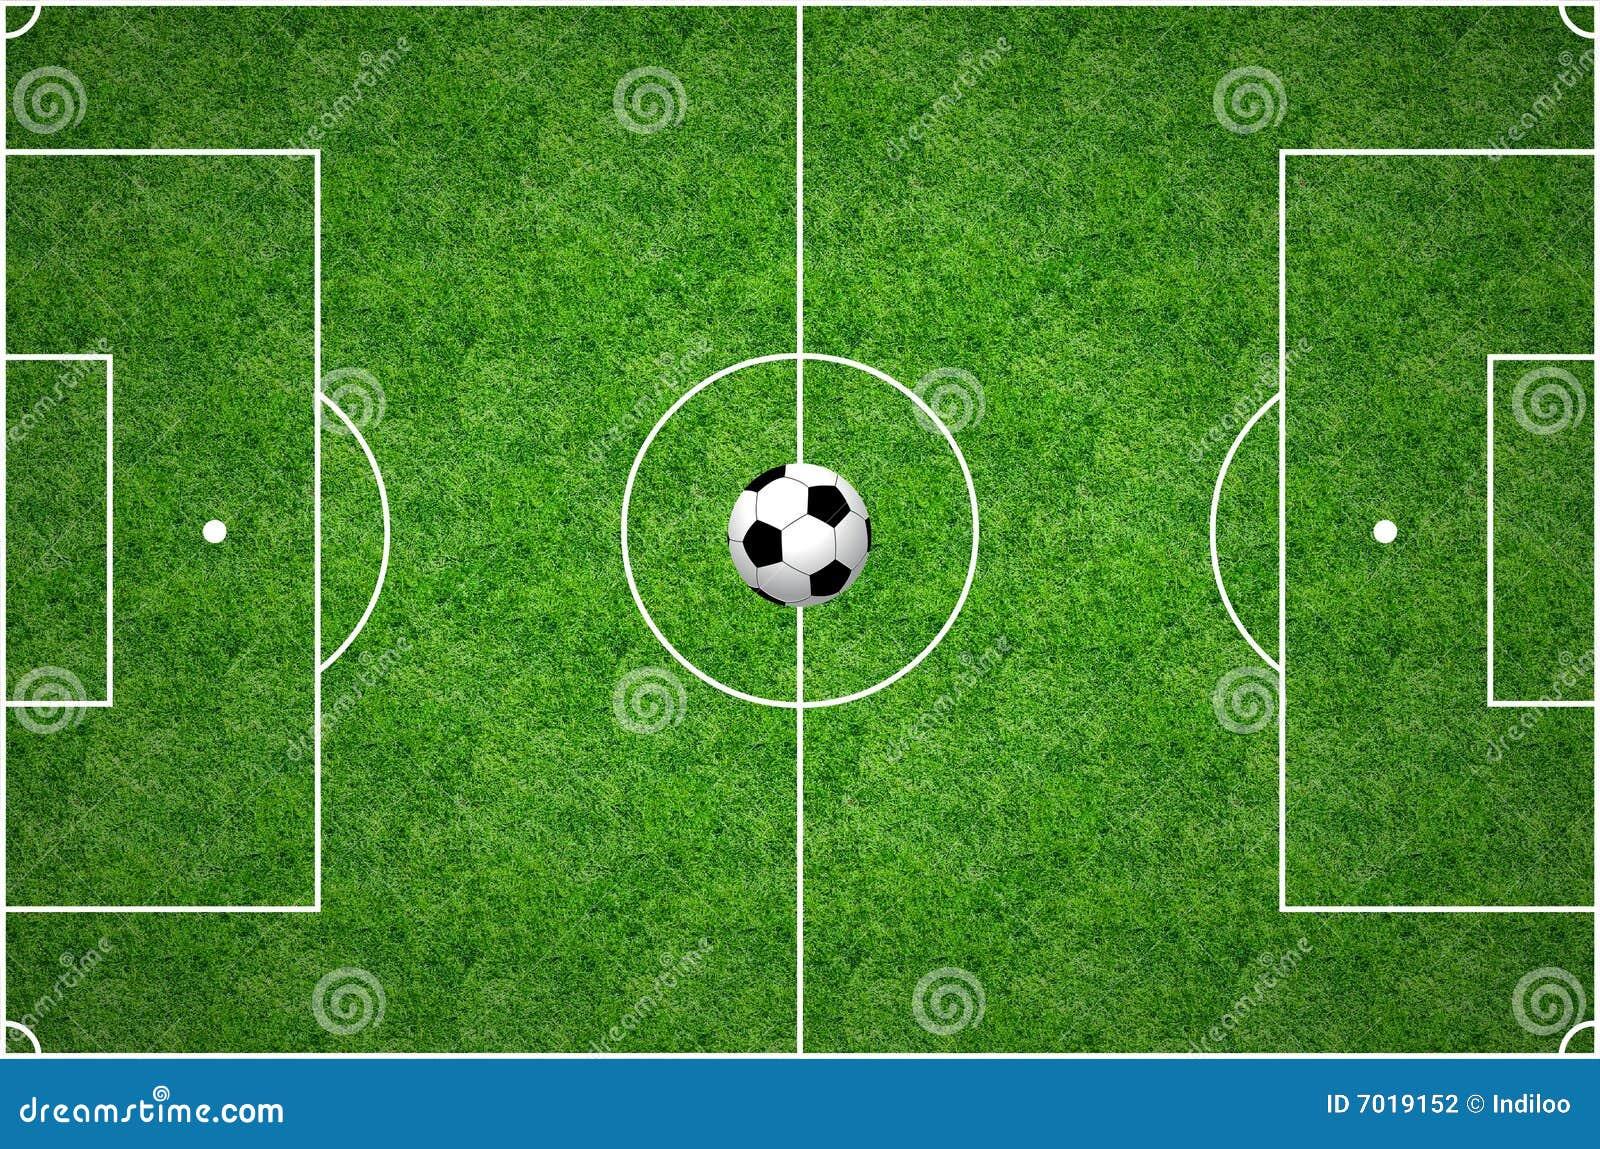 6ae83dac4 Football Pitch stock photo. Image of championship, playing - 7019152